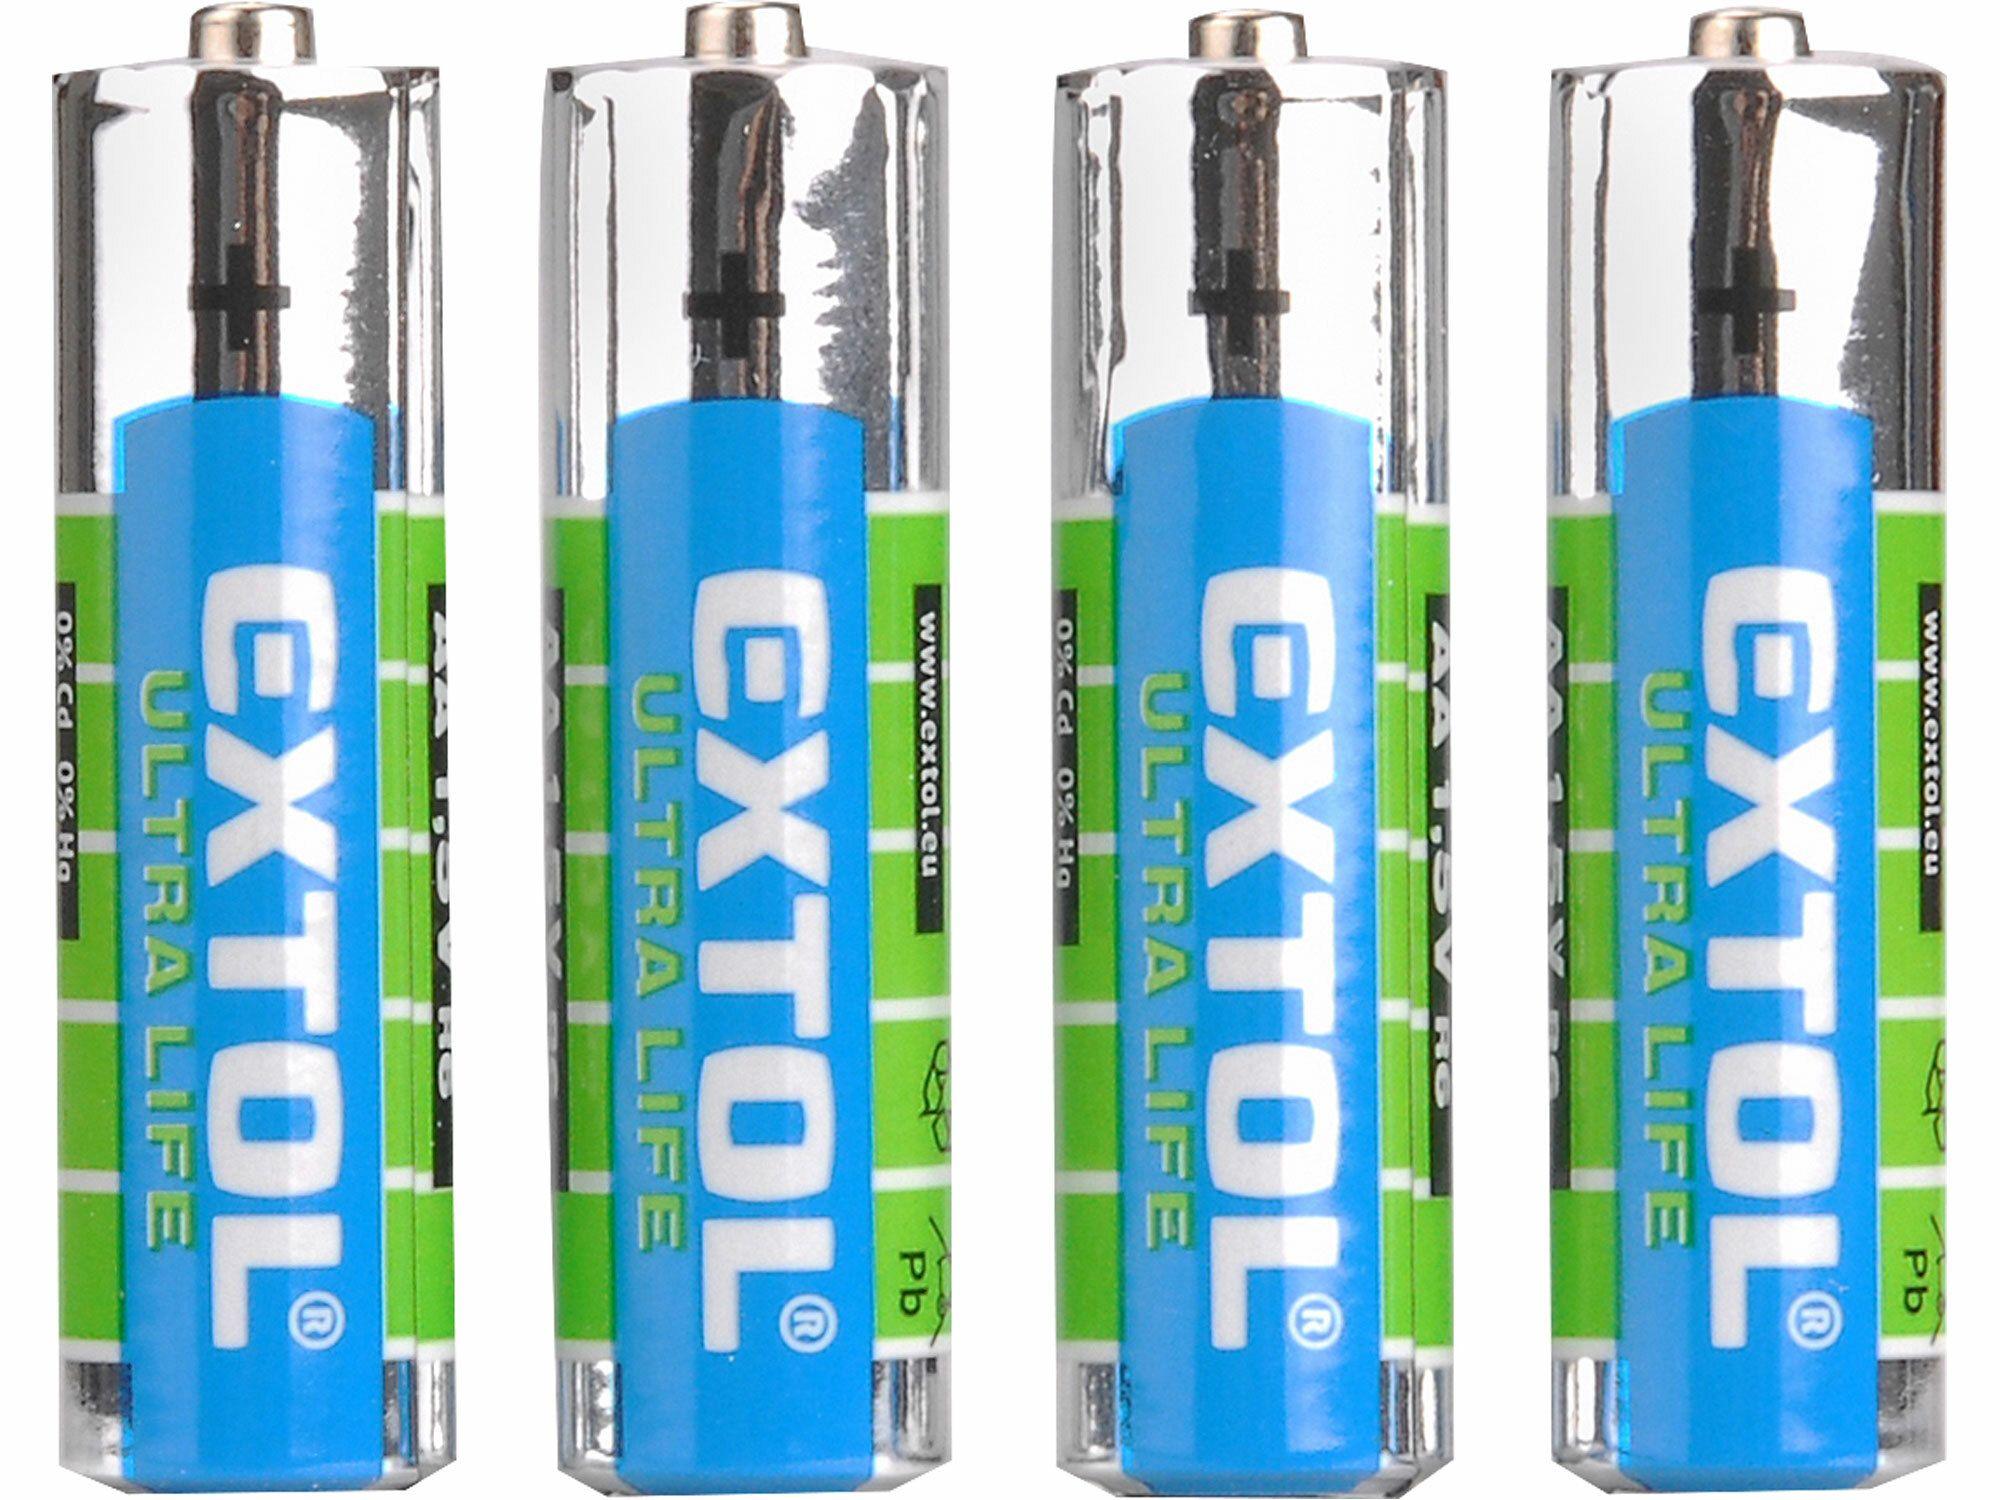 Baterie zink-chloridové, 4ks, 1,5V AAA (LR03), EXTOL LIGHT